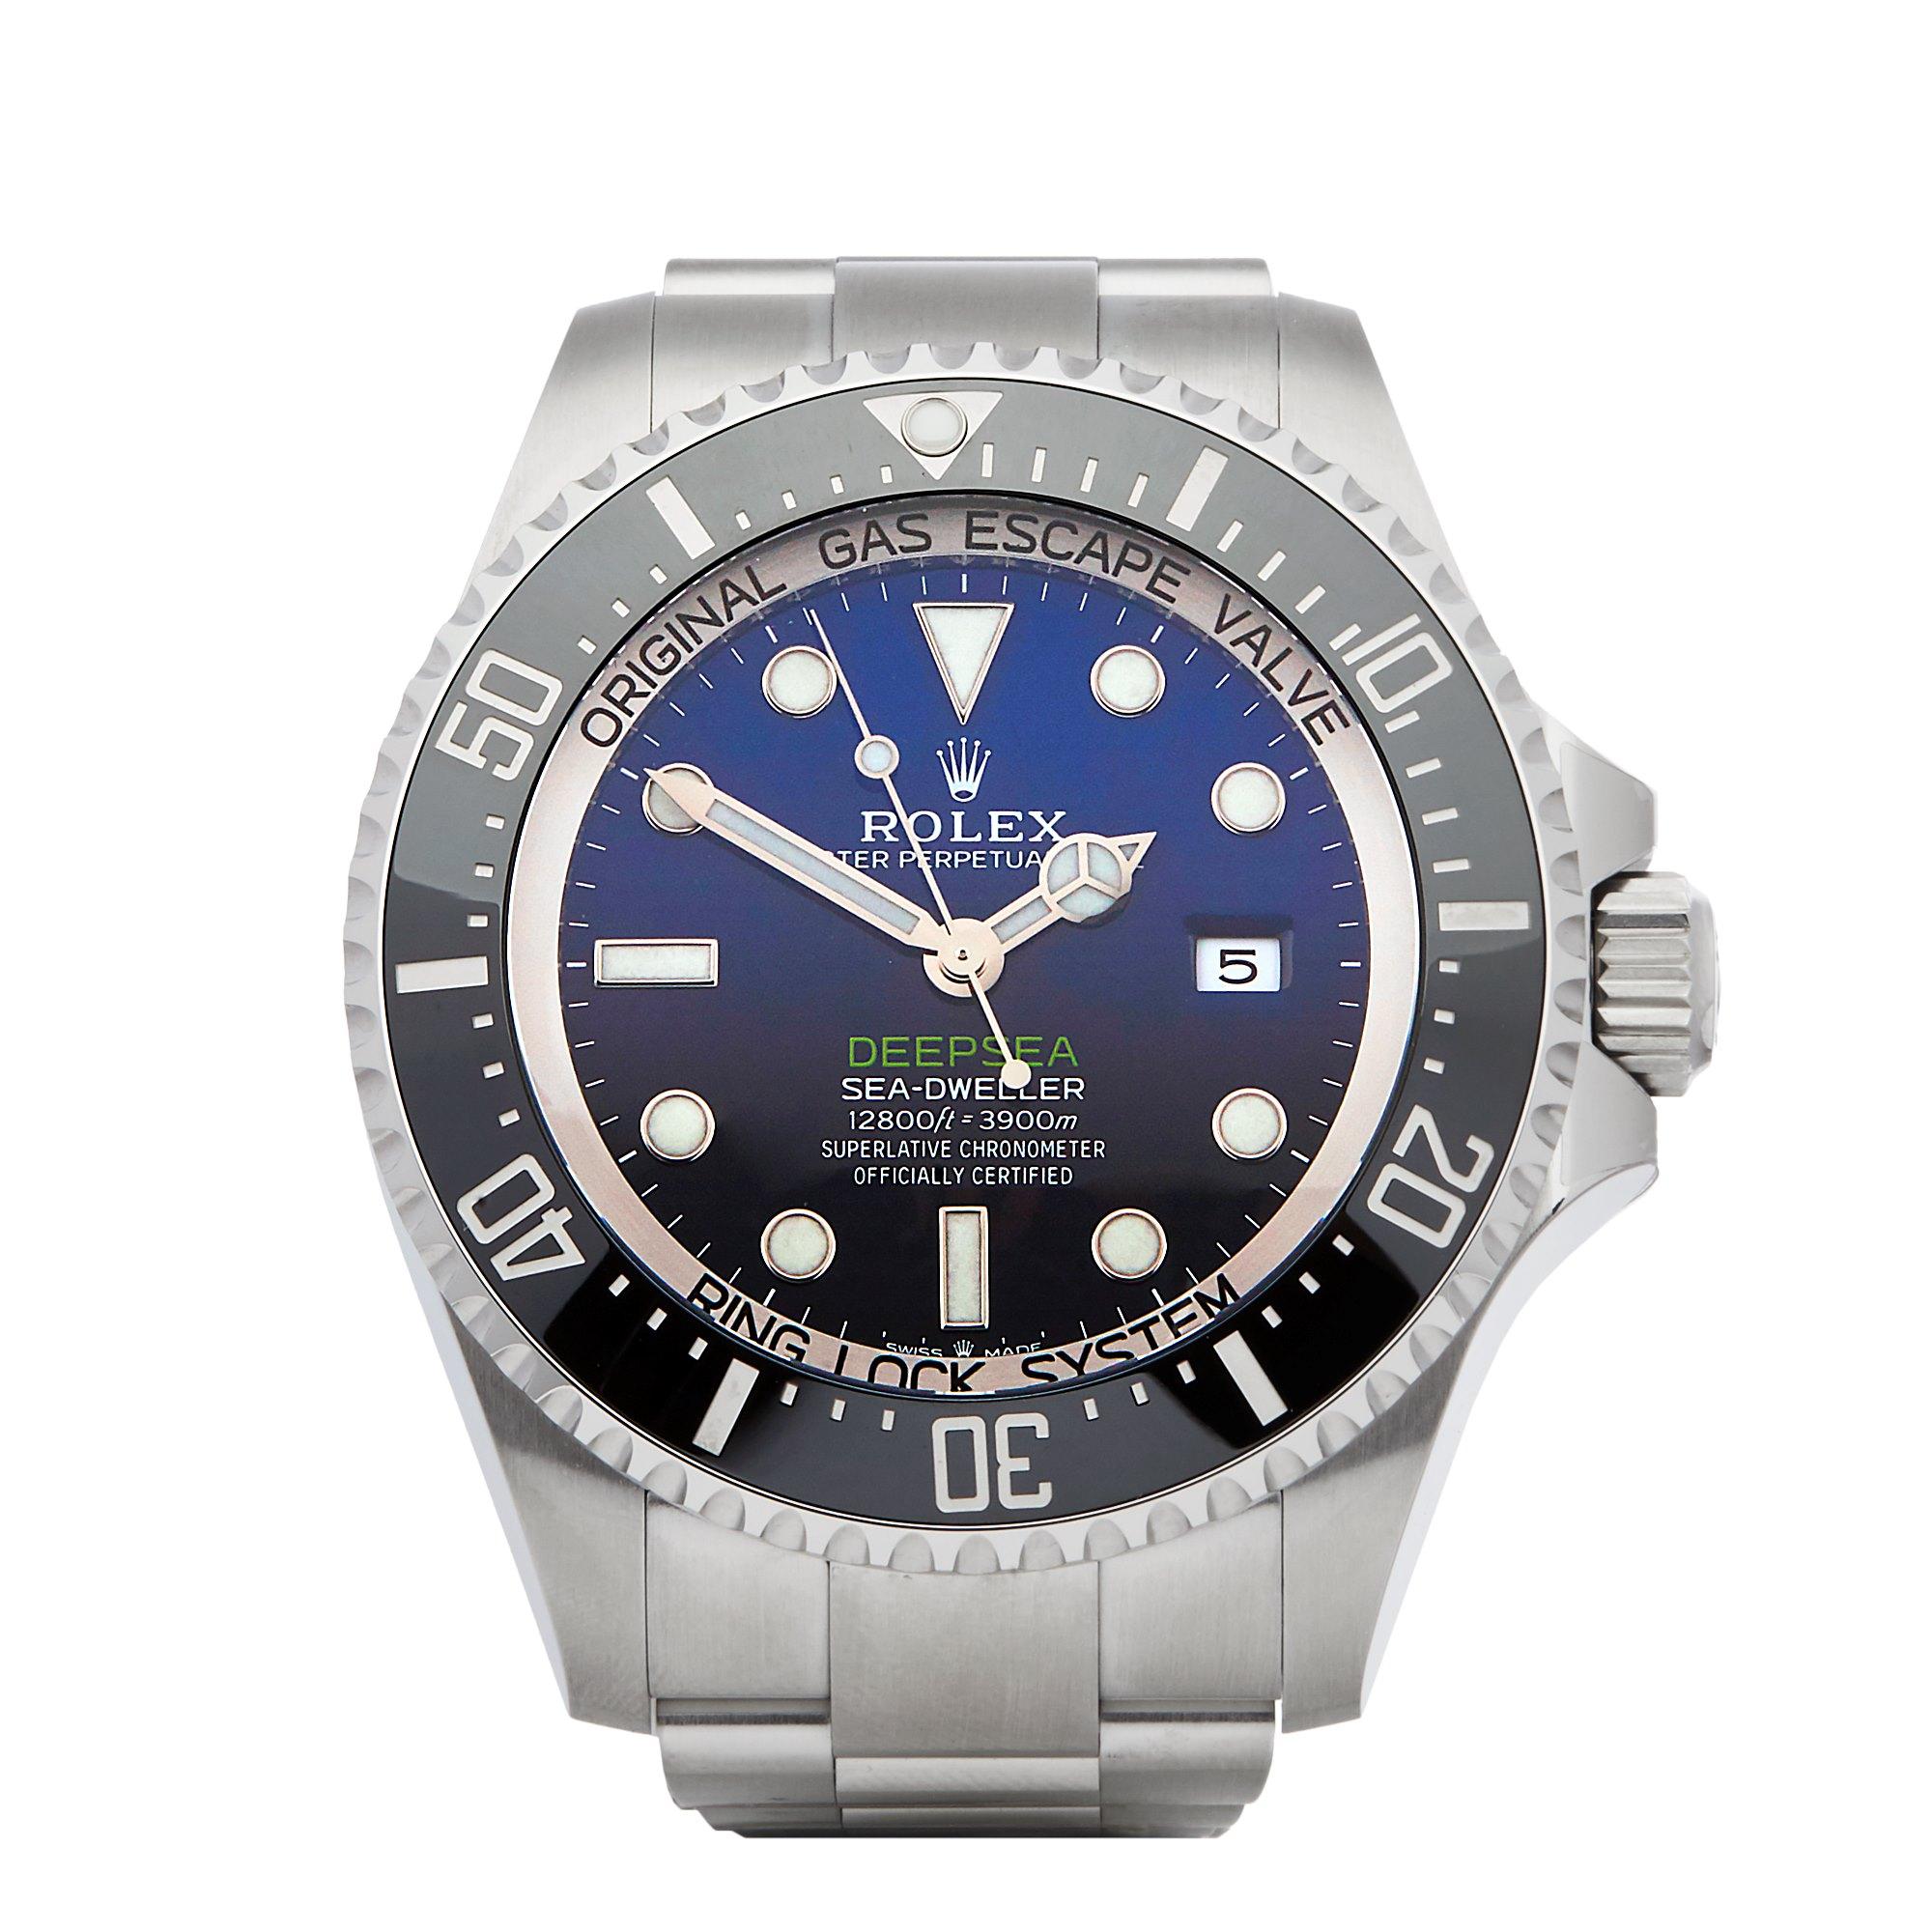 Rolex Sea-Dweller Deep Sea James Cameron Deep Blue Stainless Steel 126660